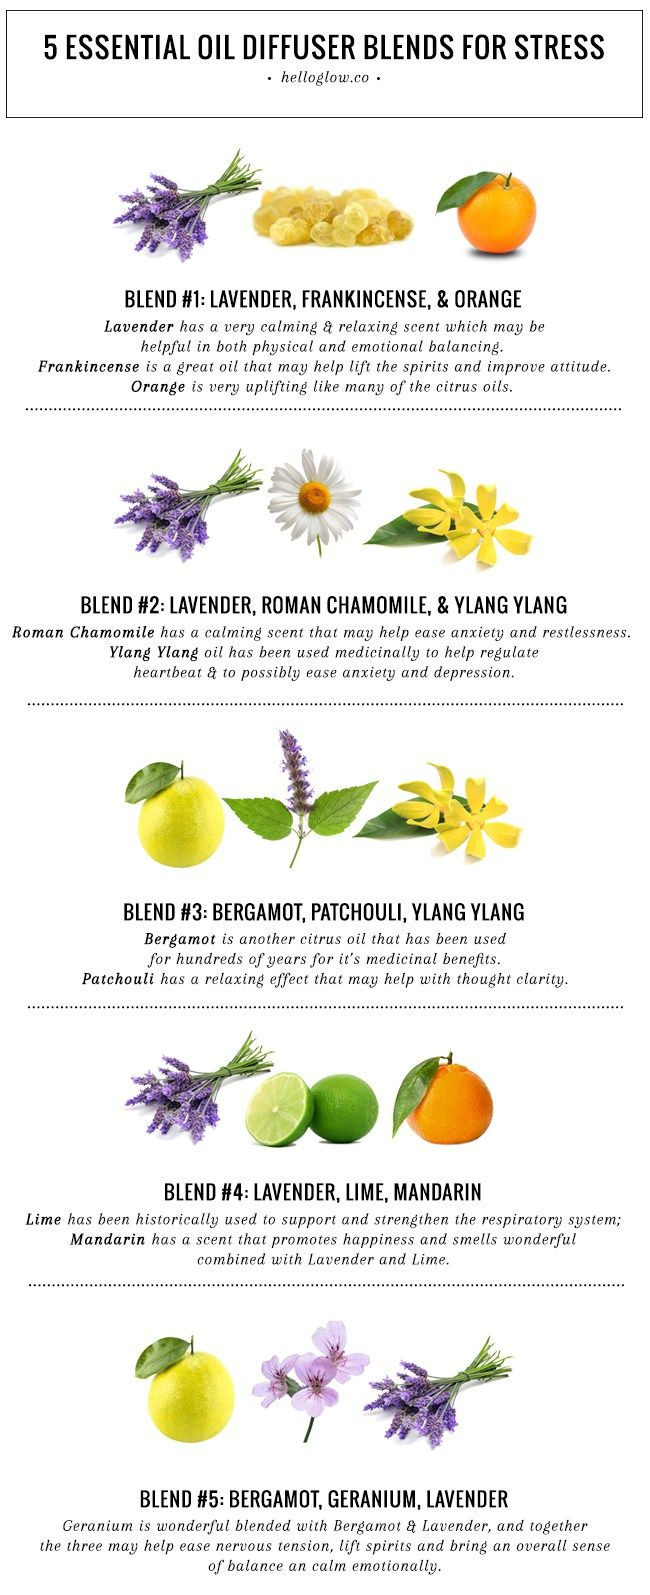 5 Essential Oil Diffuser Recipes for Stress